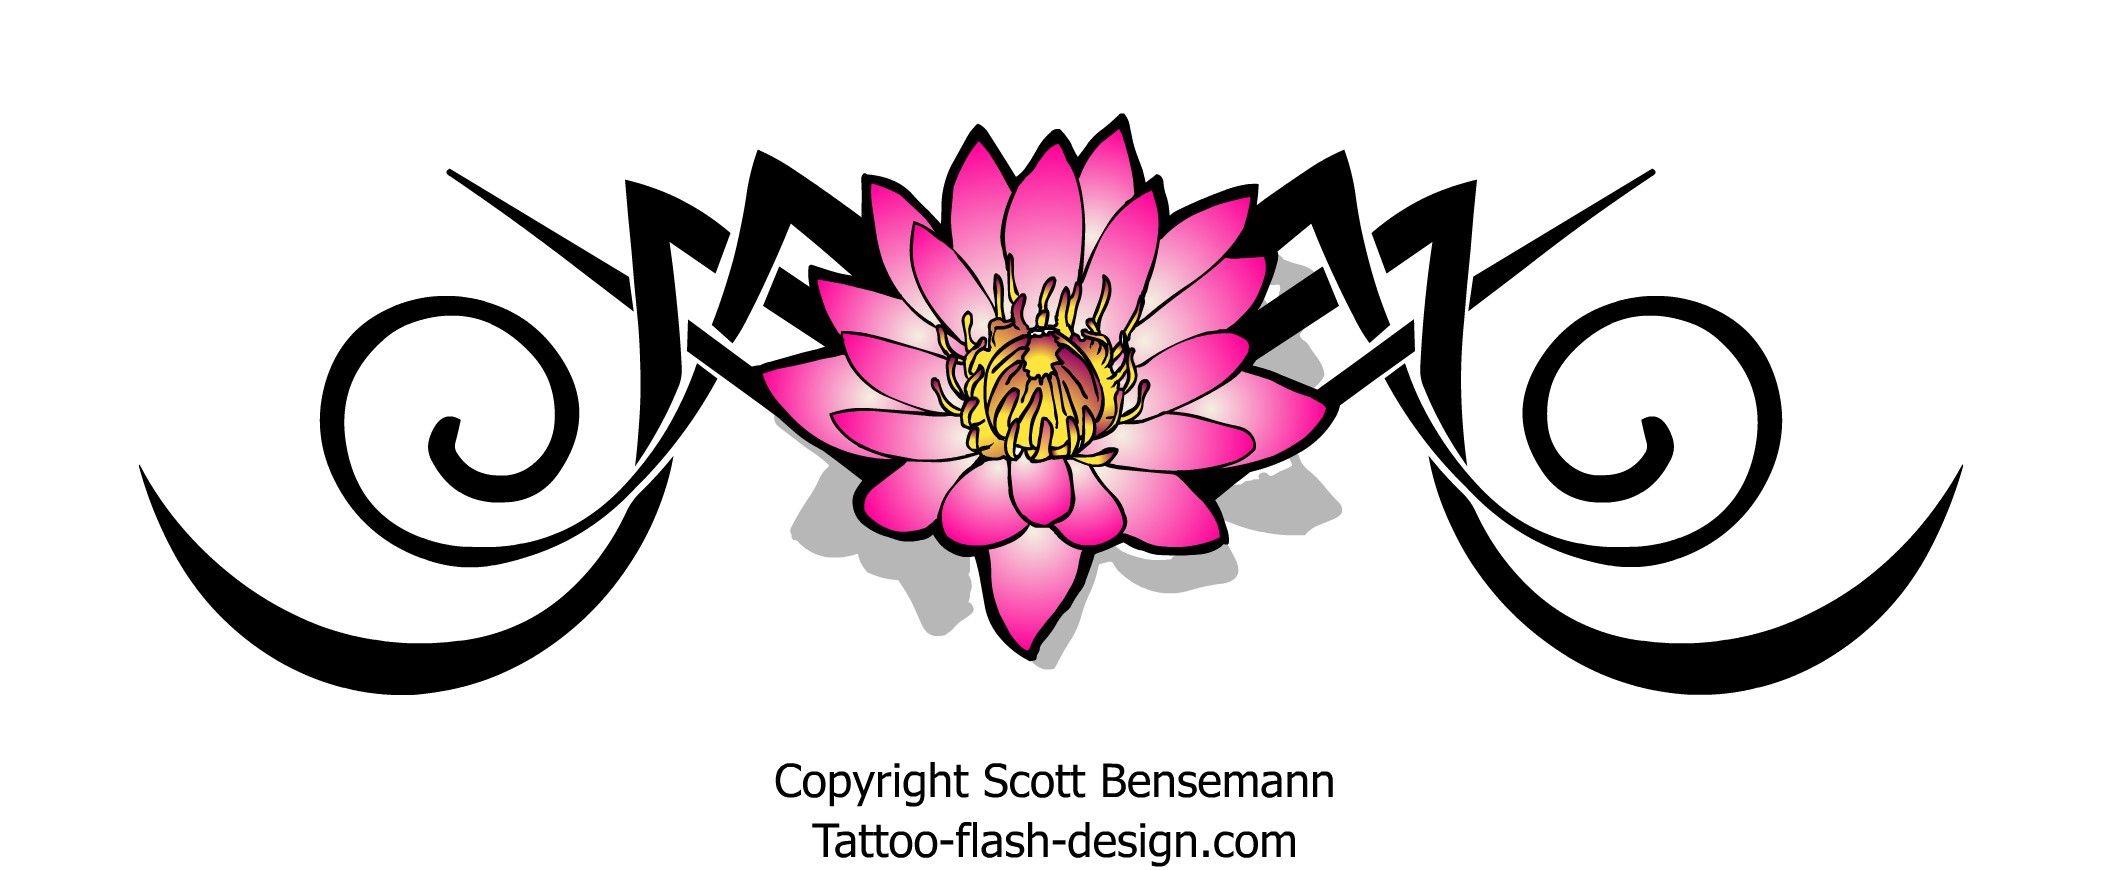 Tribal lotus flower tattoo design things to wear pinterest tribal lotus flower tattoo design izmirmasajfo